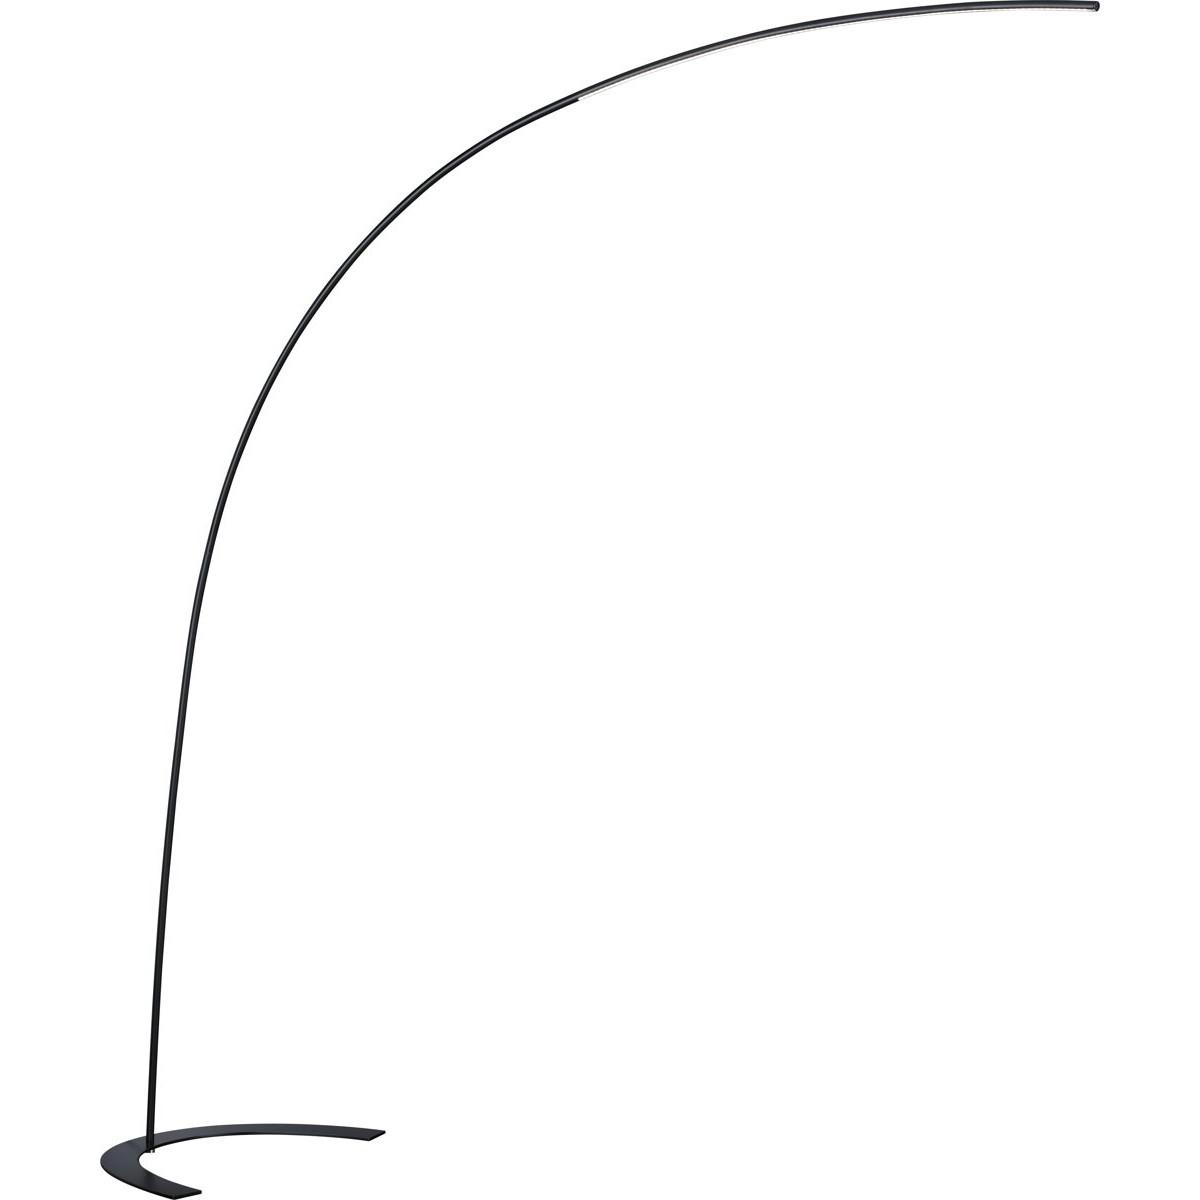 LED Vloerlamp - Trion Shio - 18W - Warm Wit 3000K - 1-lichts - Dimbaar - Rond - Mat Zwart - Aluminiu